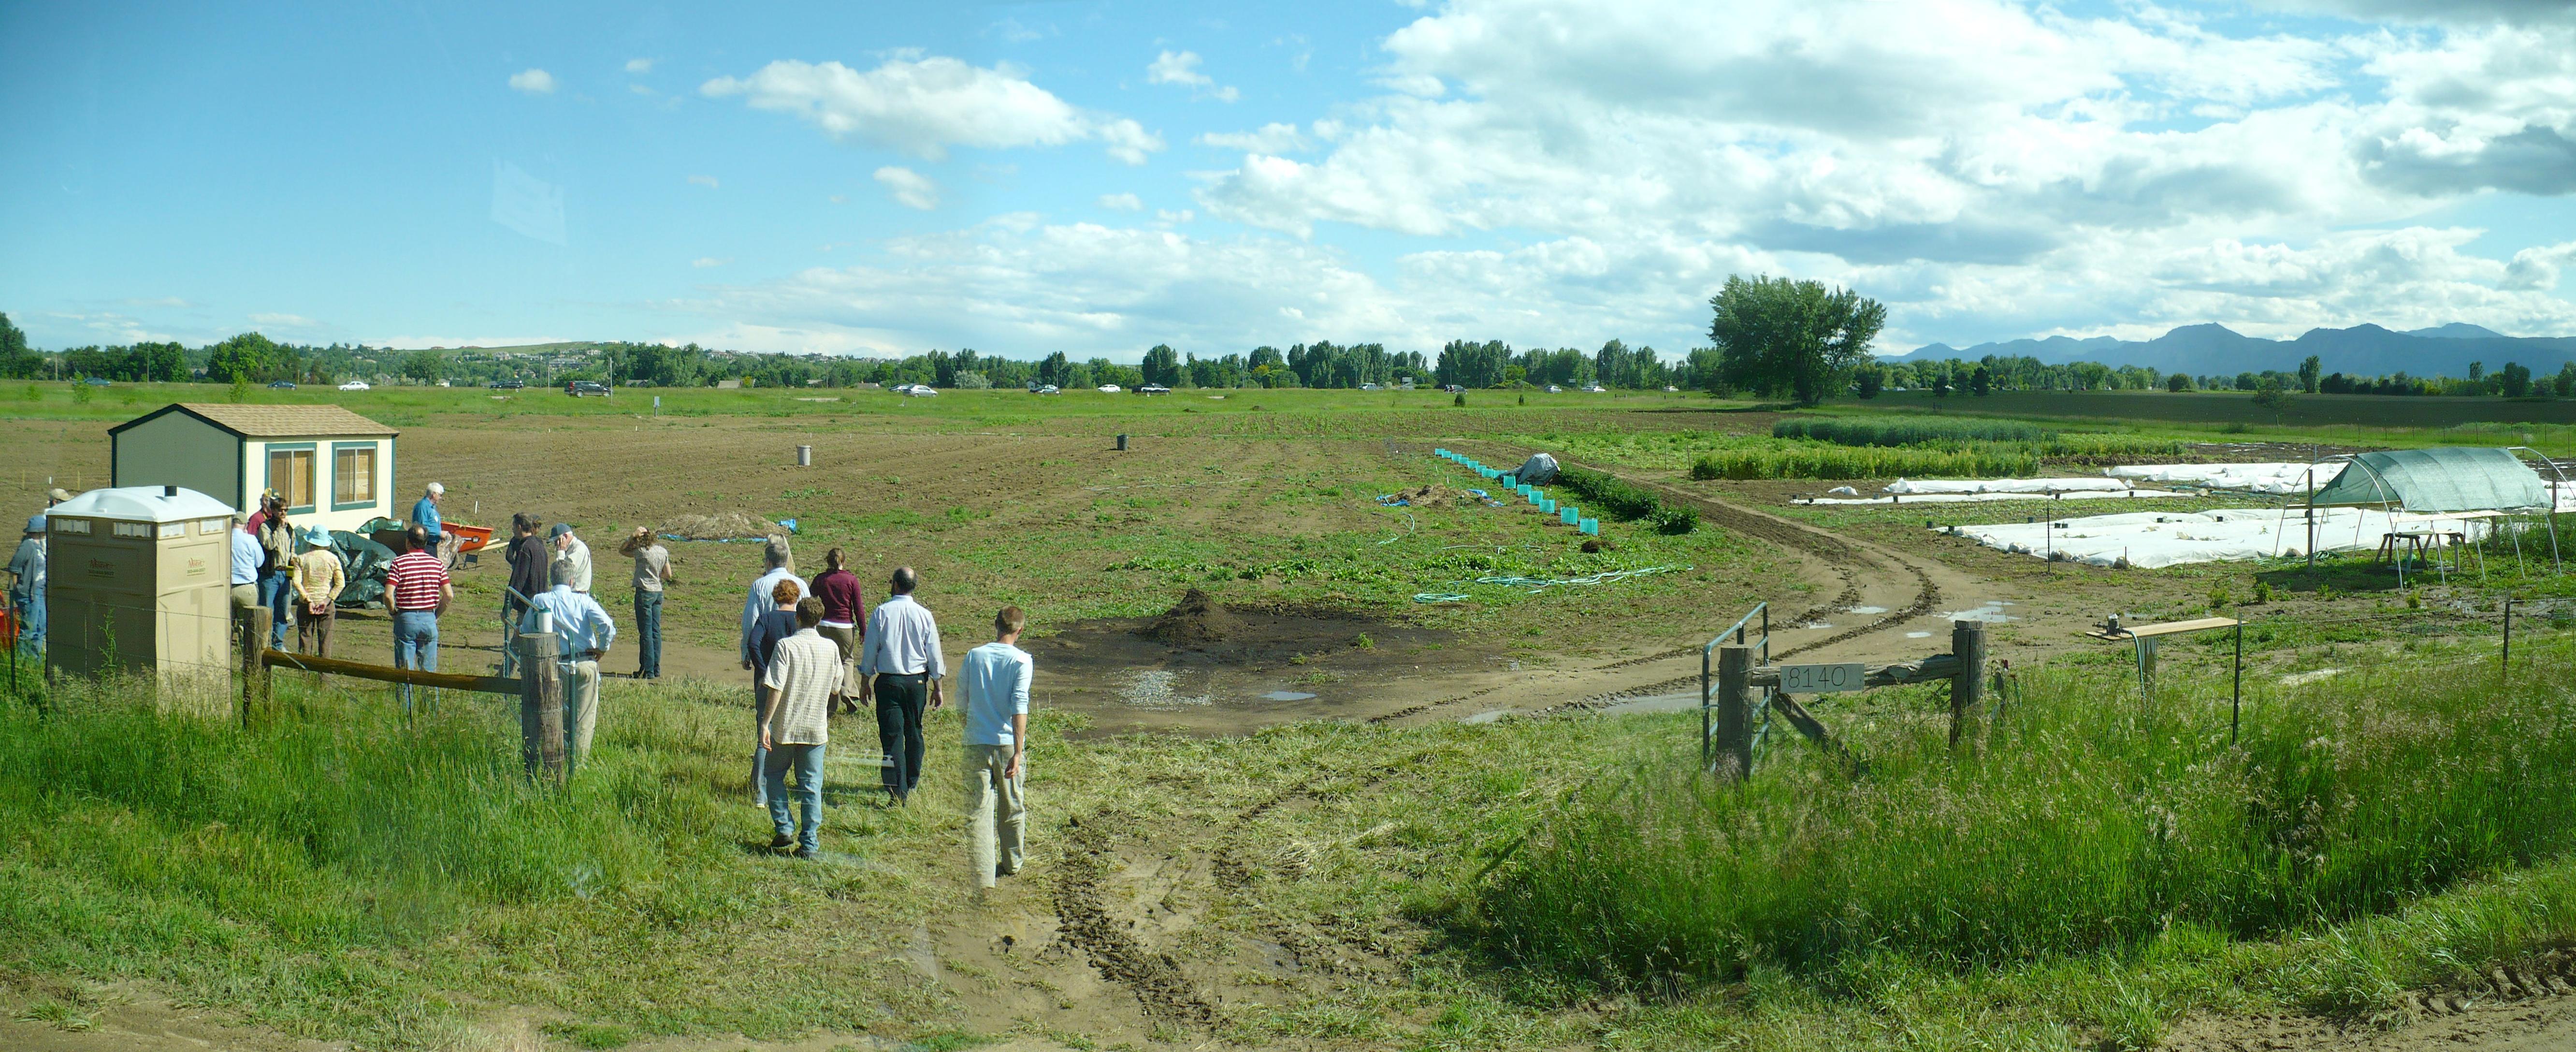 colorado growers association 2